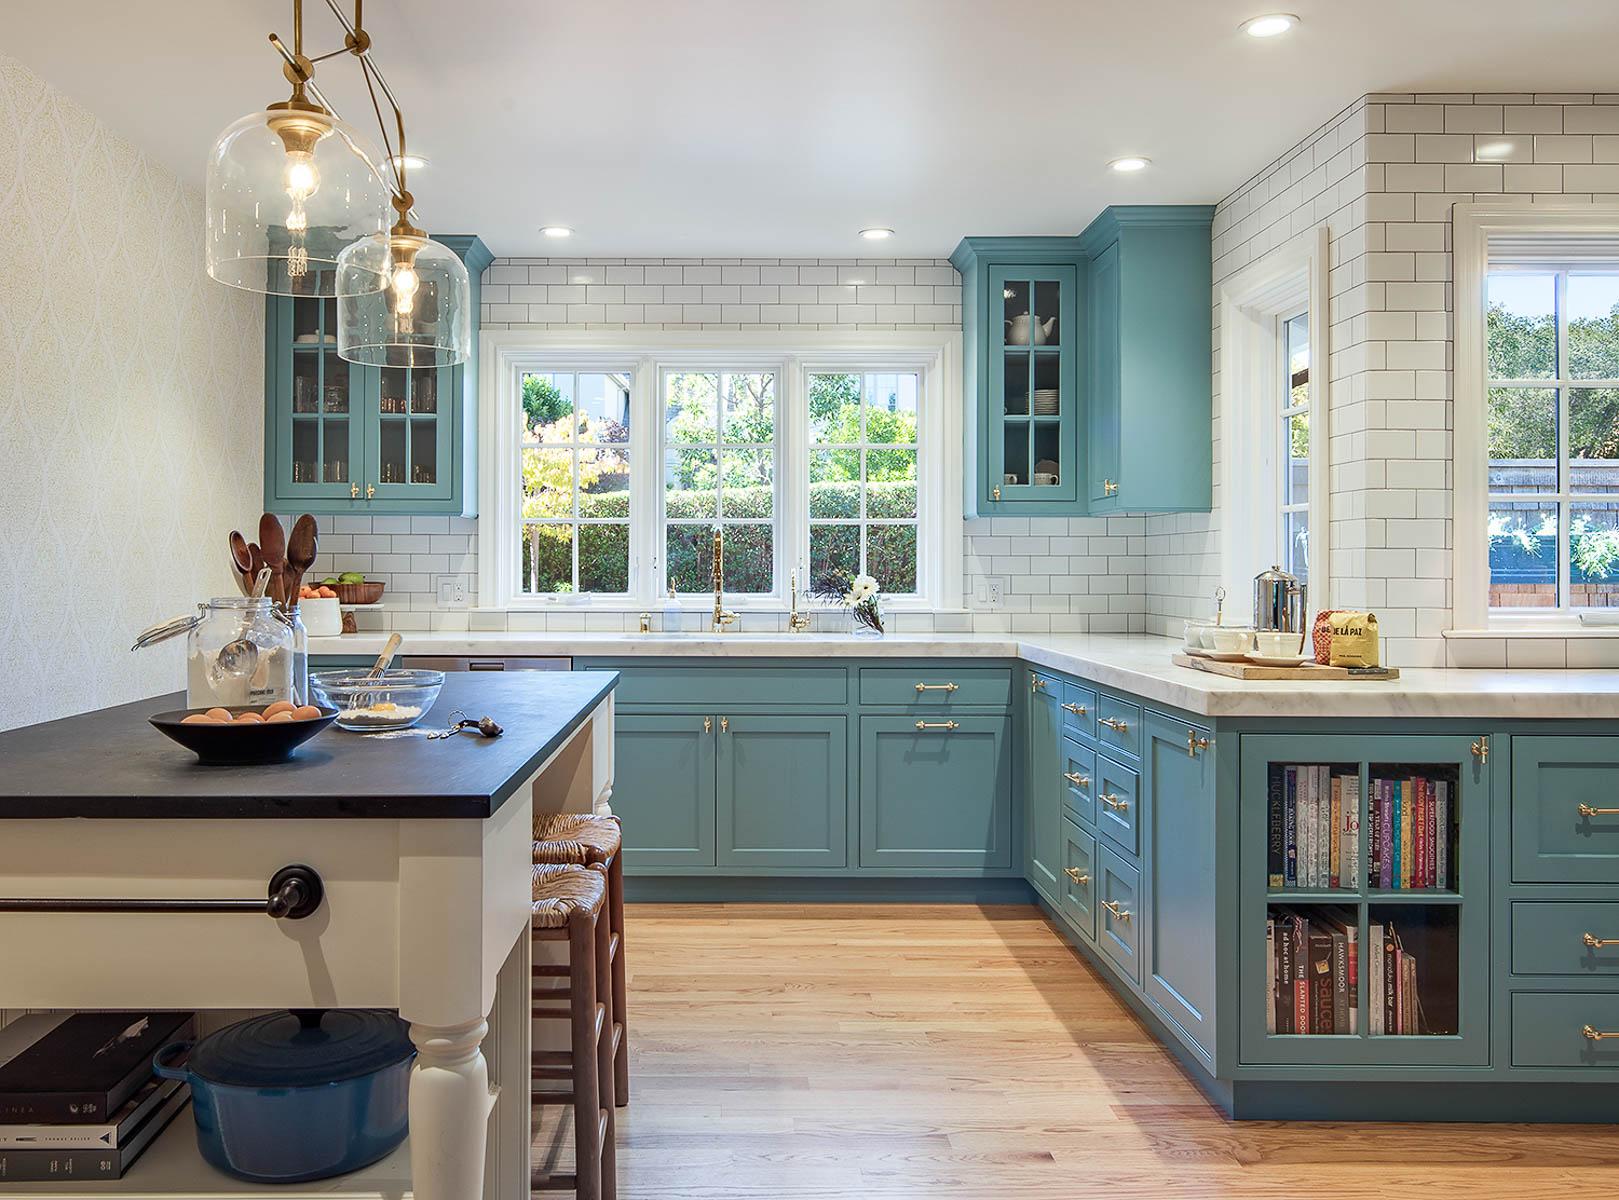 LMB_Interiors_Hillsborough_Green_Design_Kitchen_AFTER_2